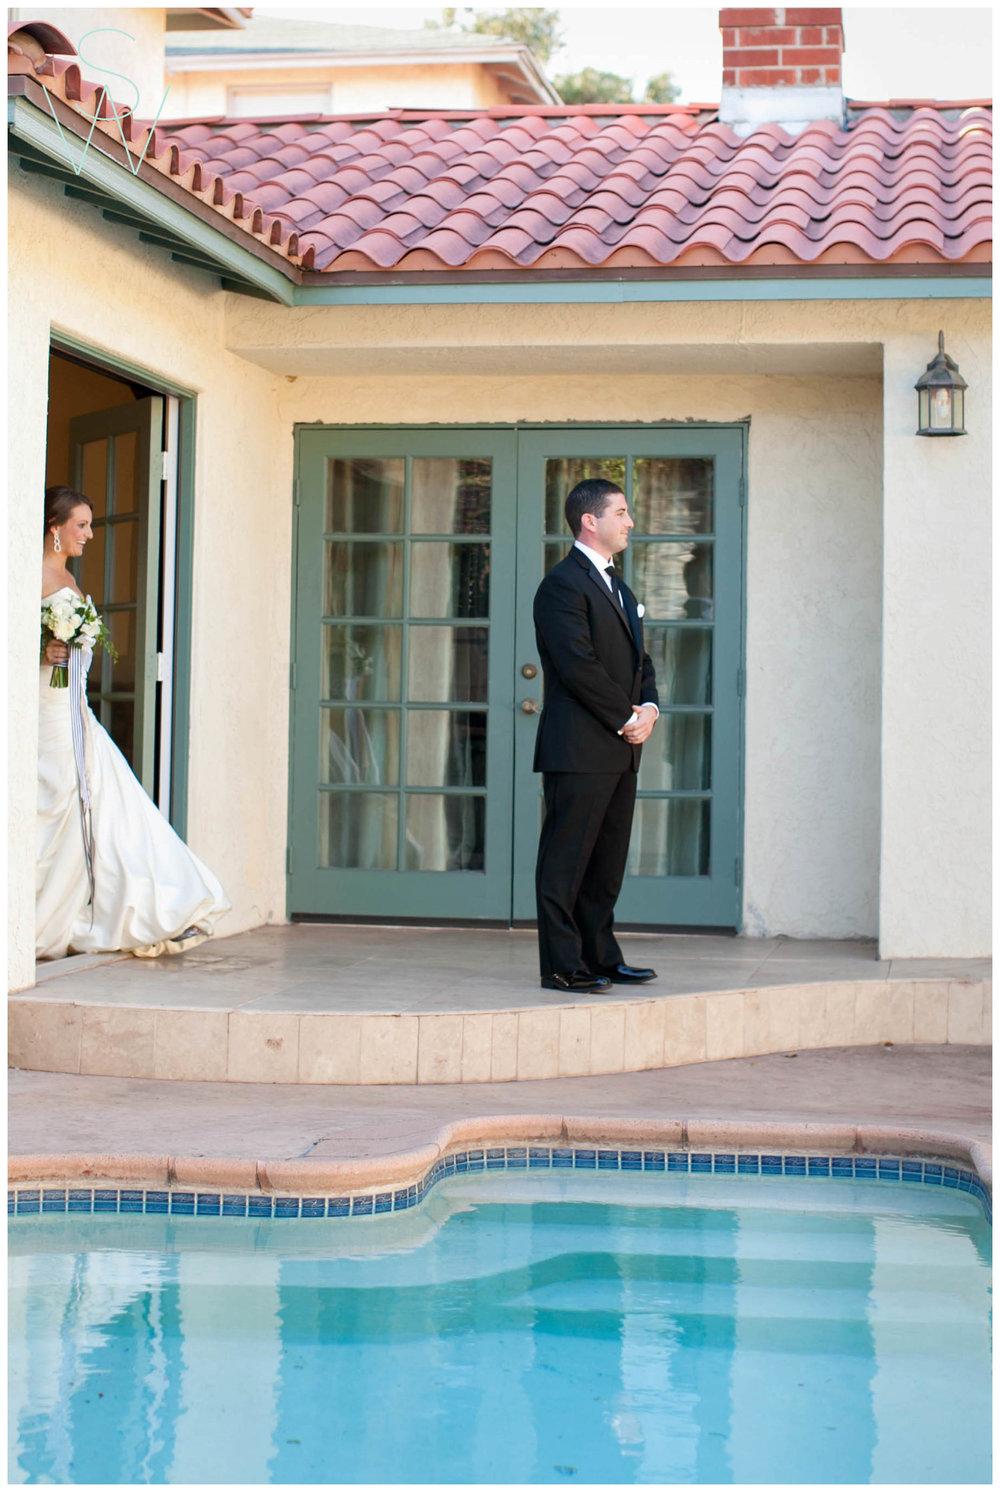 Shewanders.sdma_.wedding.photography-1016.jpg.wedding.photography-1016.jpg